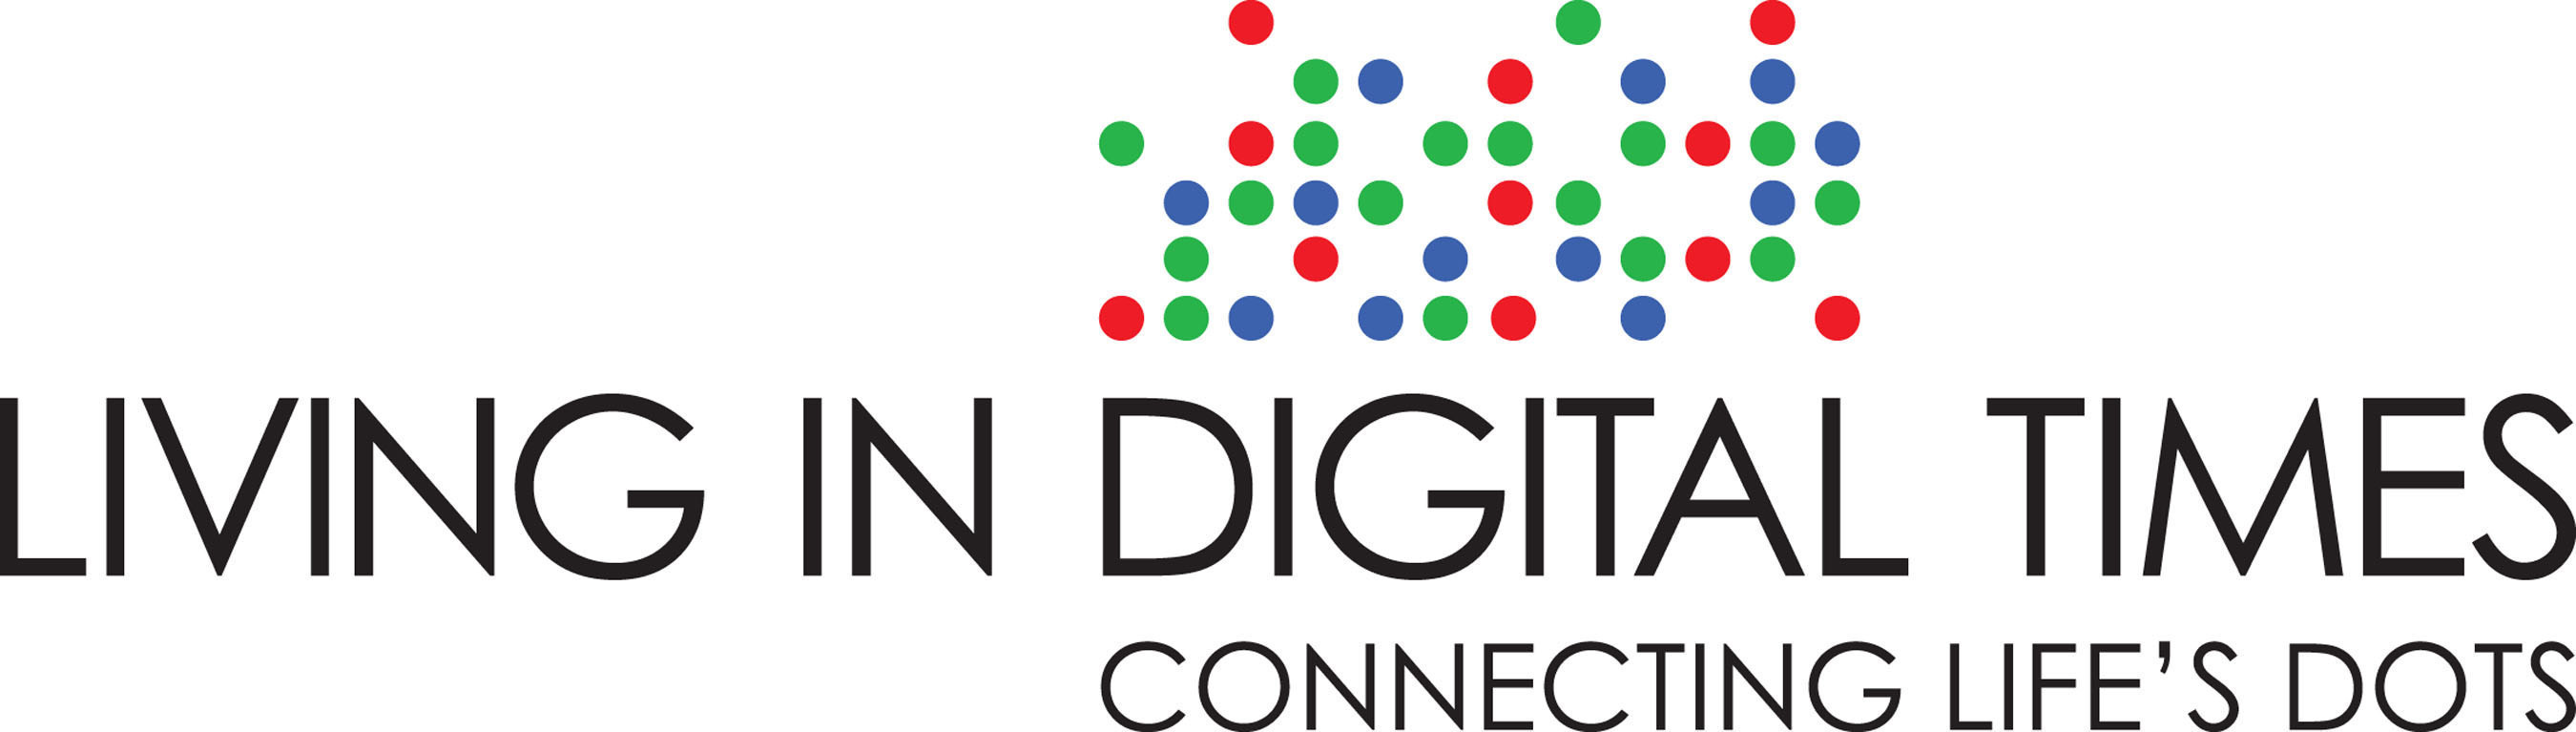 Living In Digital Times logo